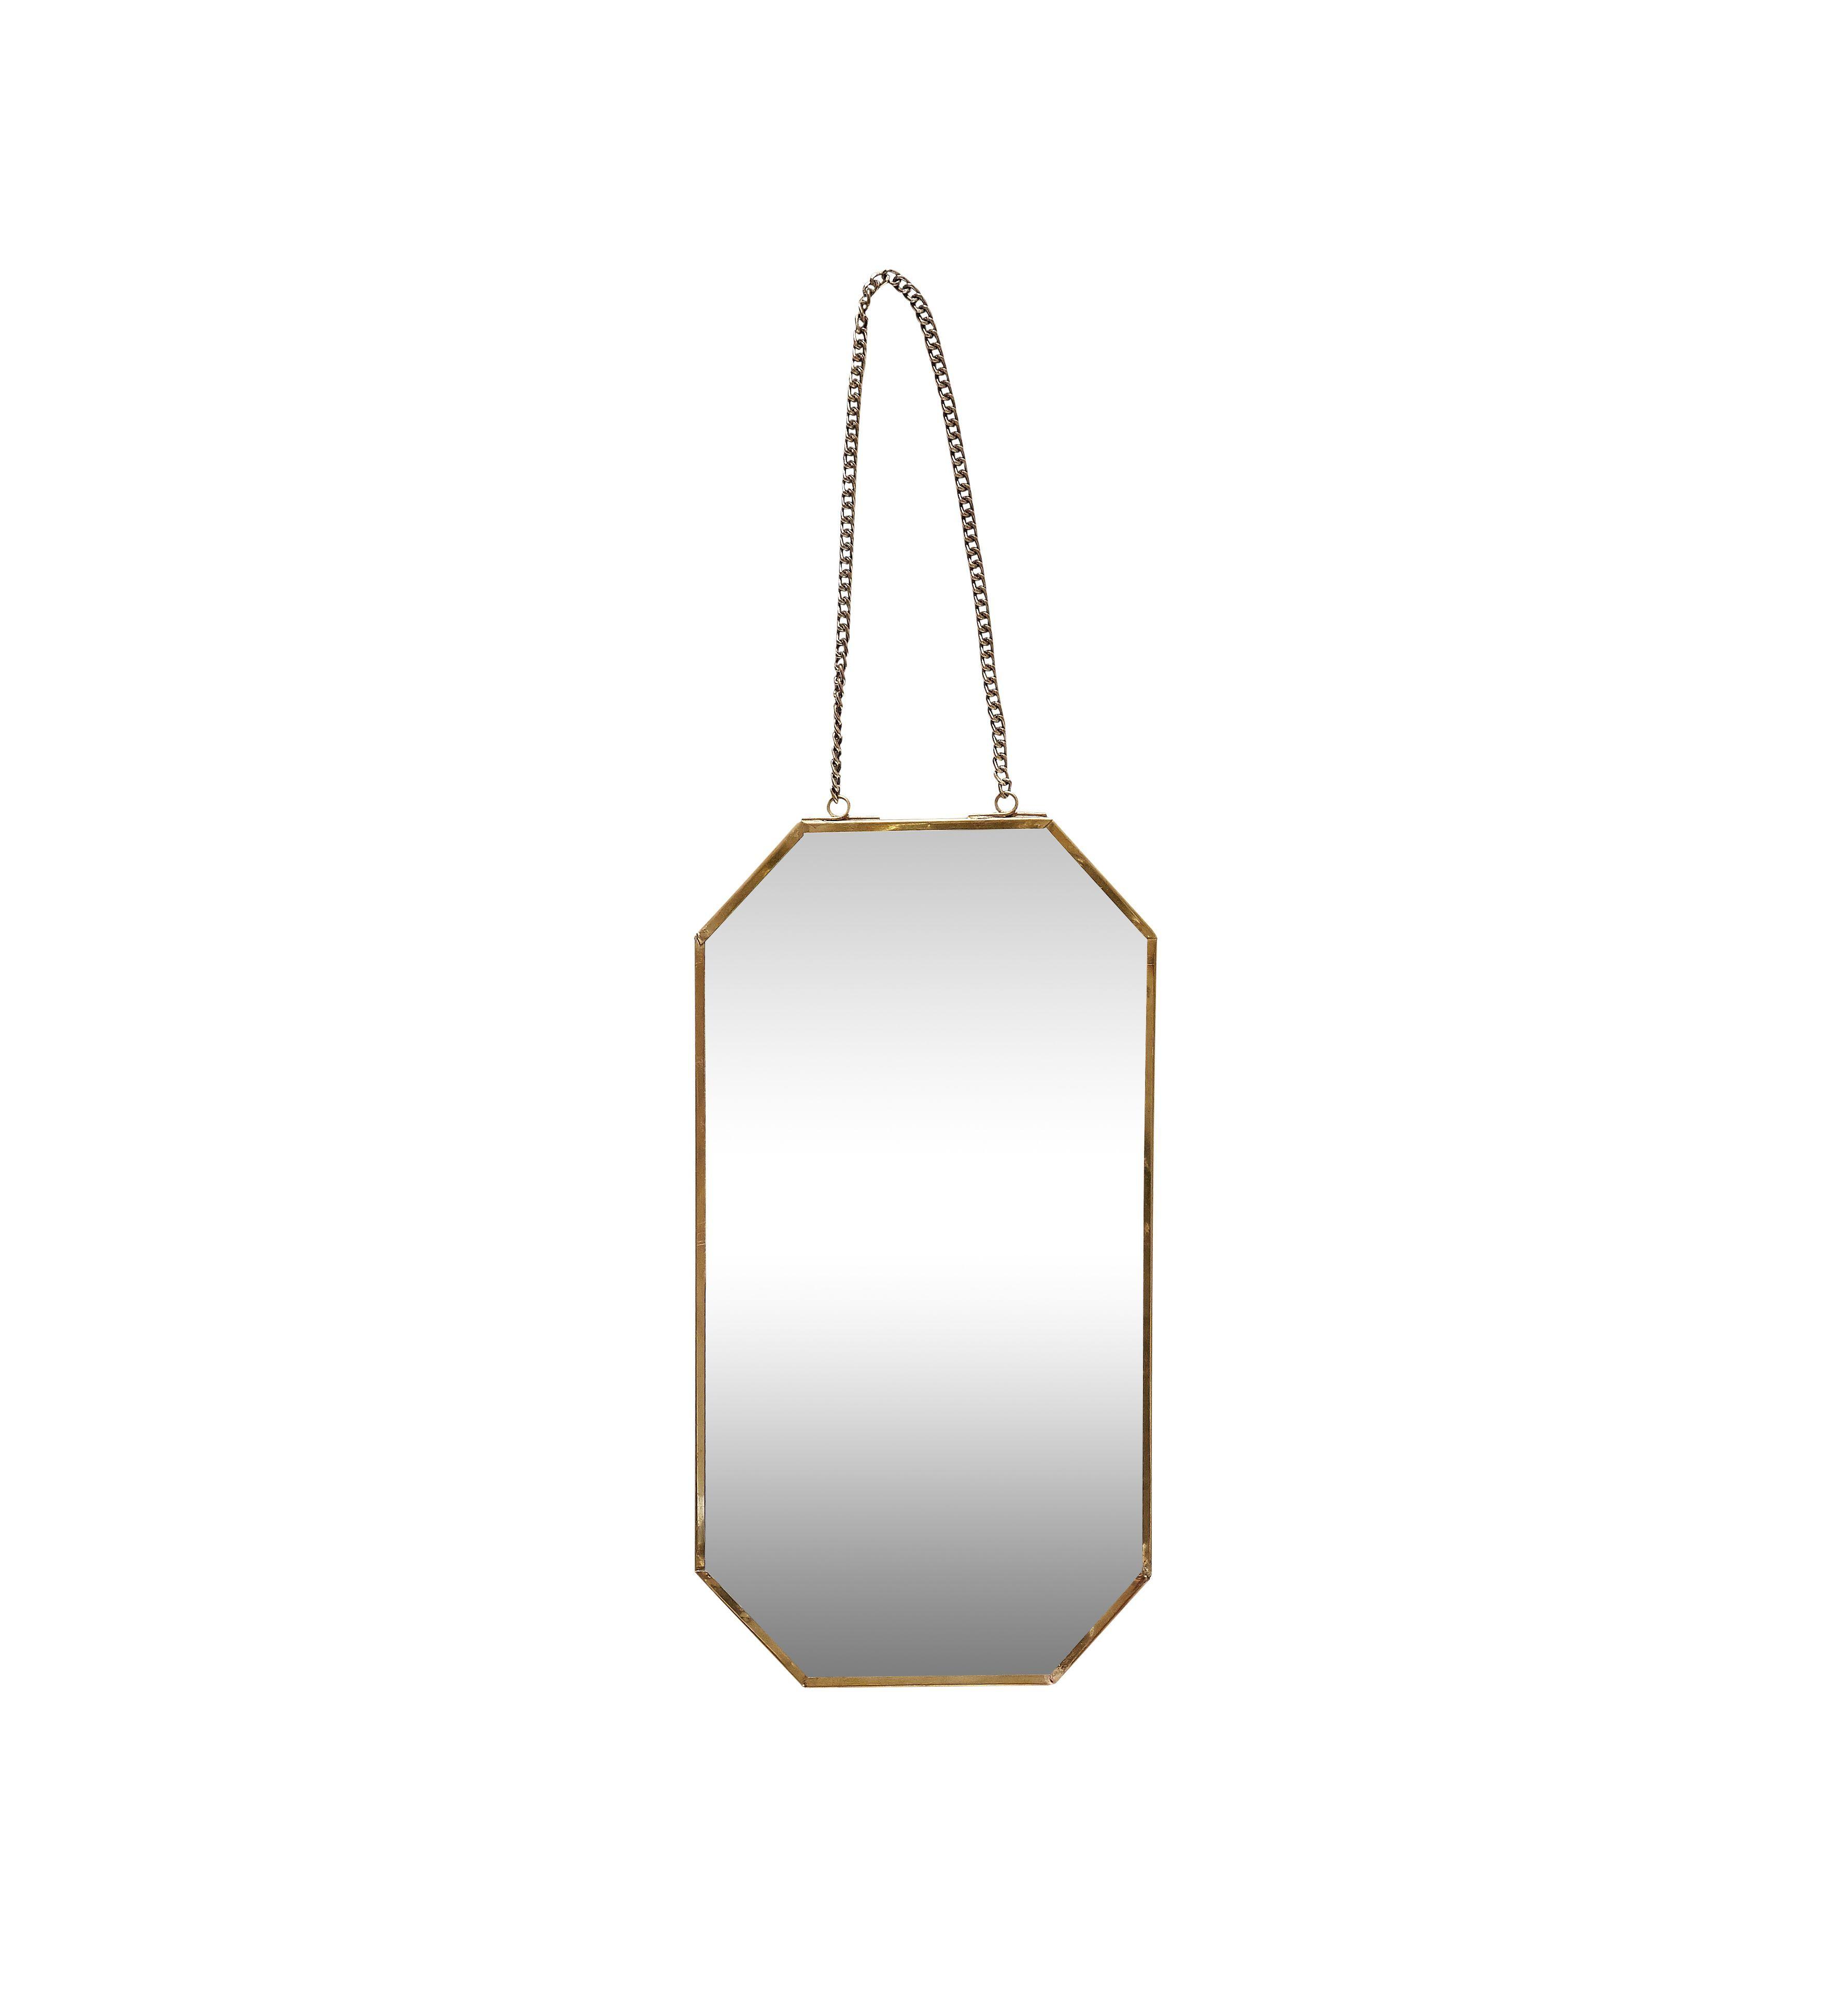 Miroir octogonal - S